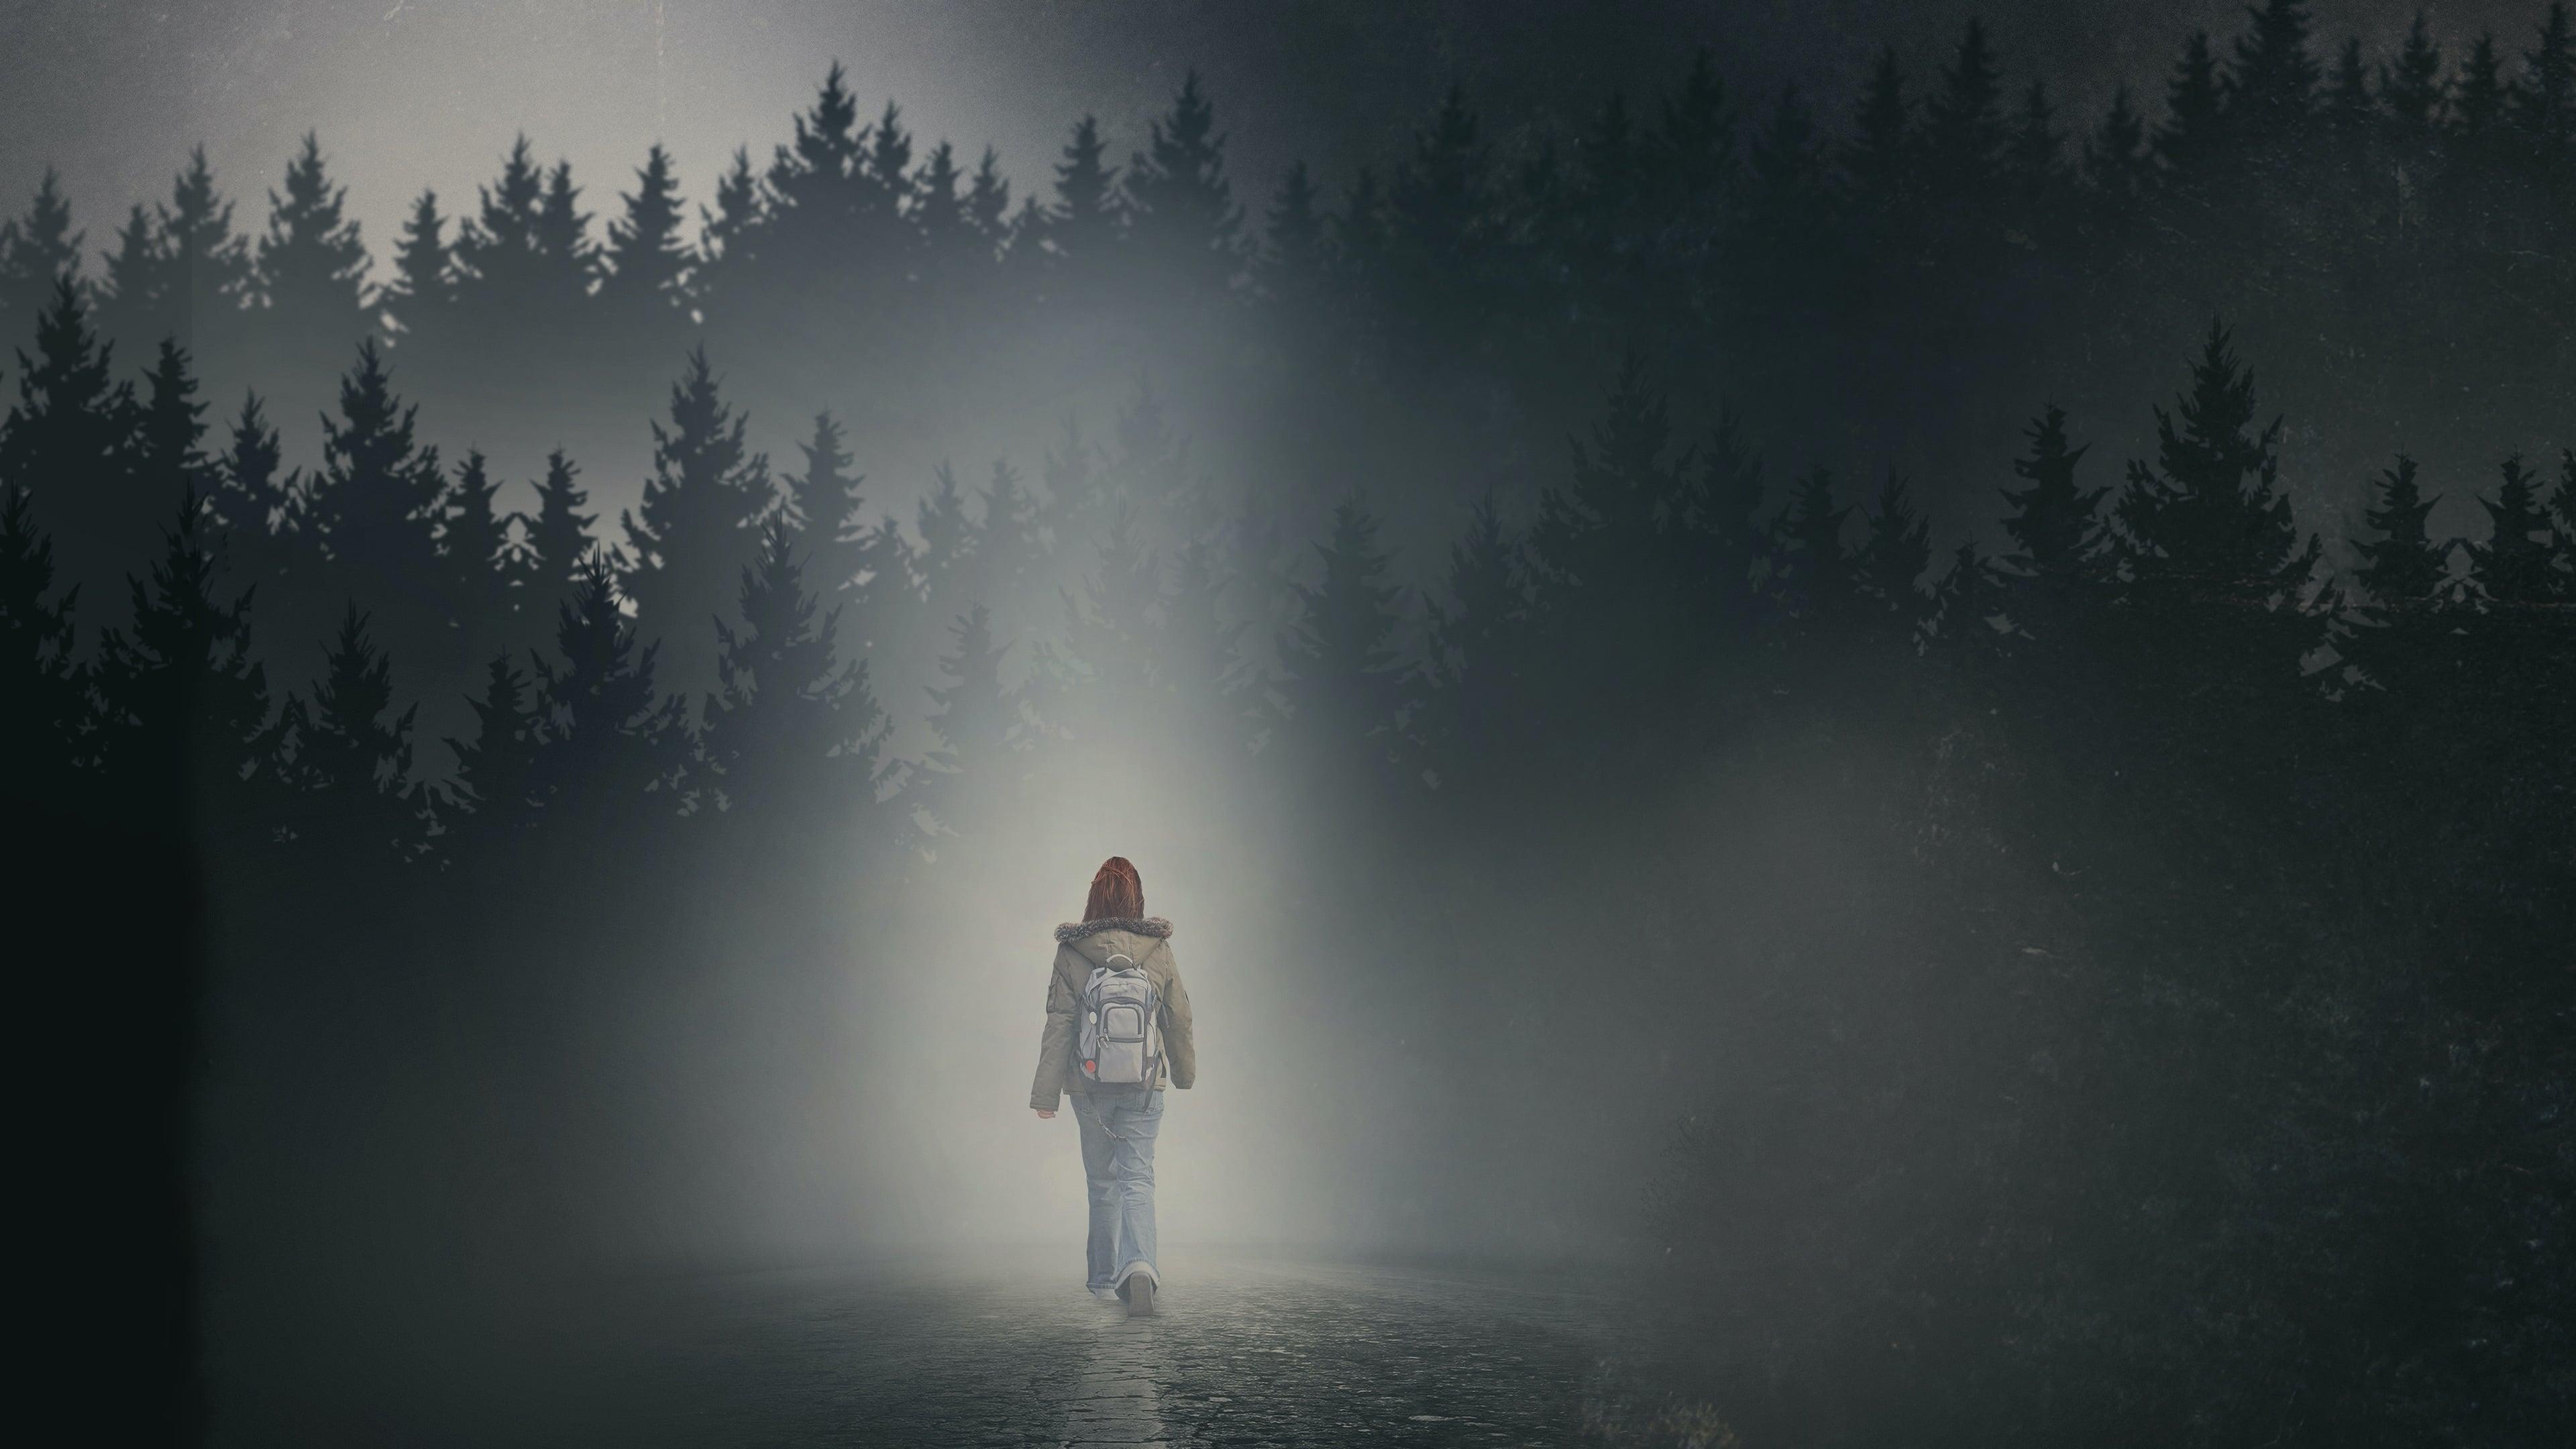 La chica en la niebla